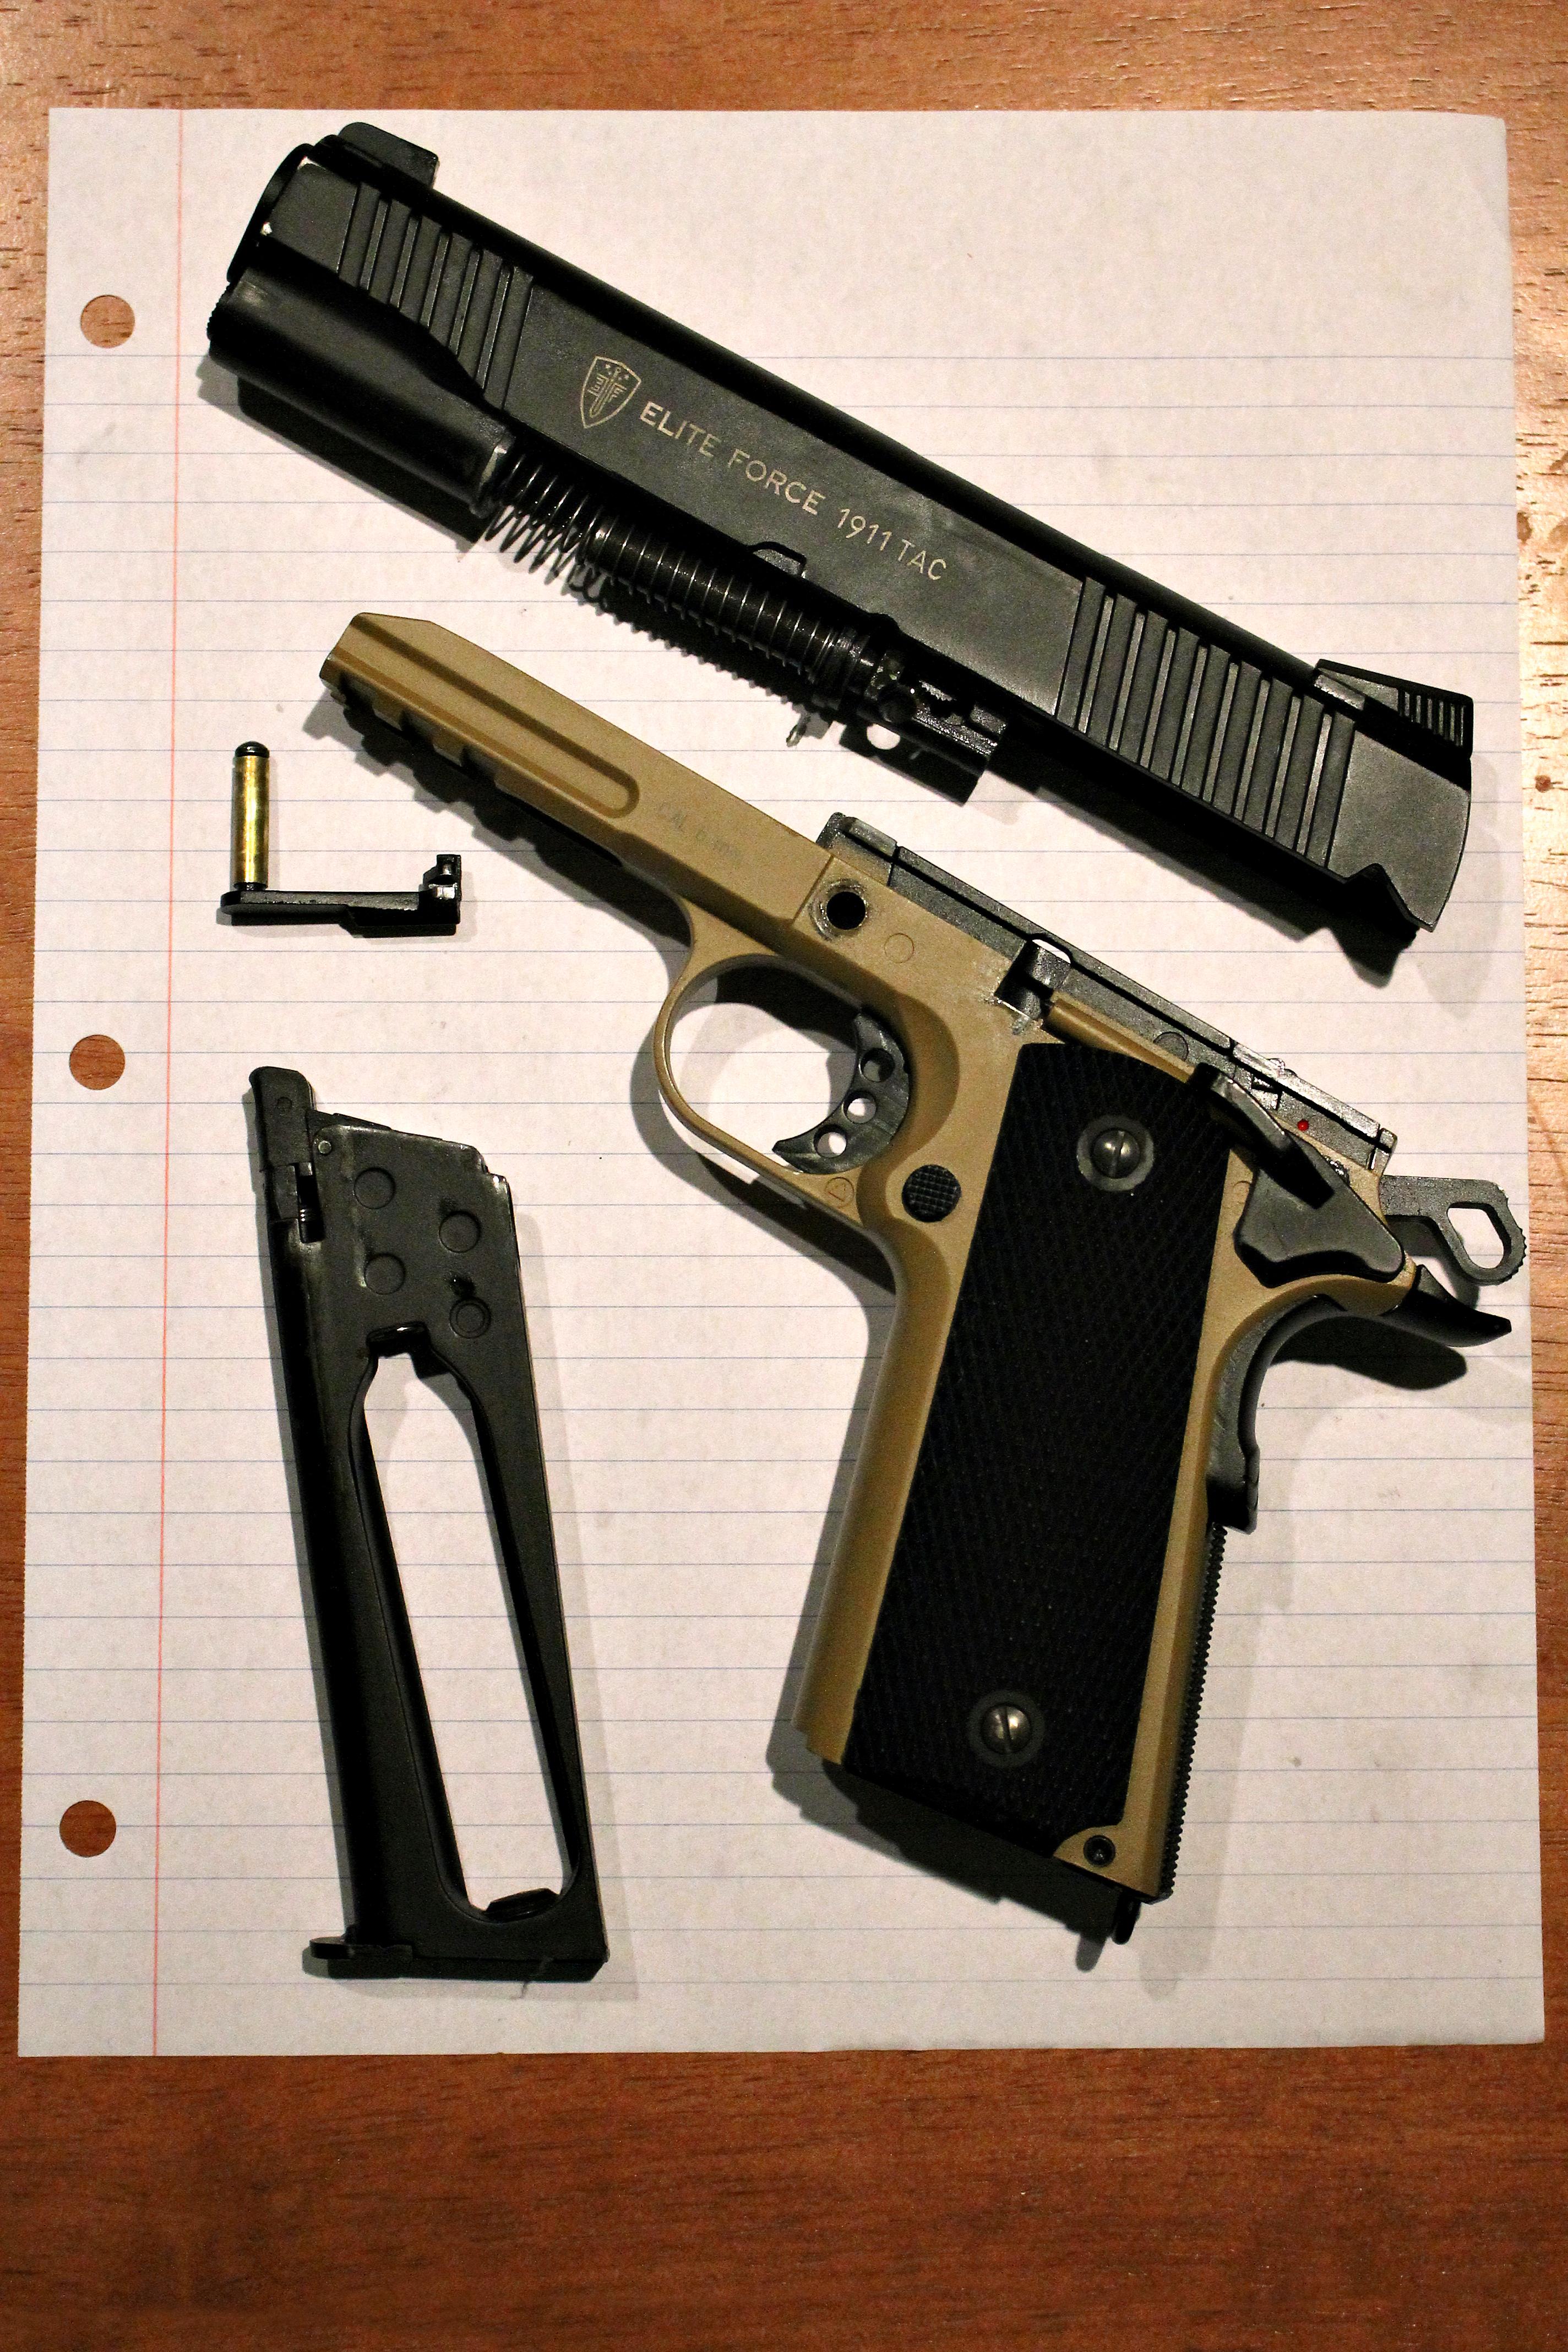 GunParts